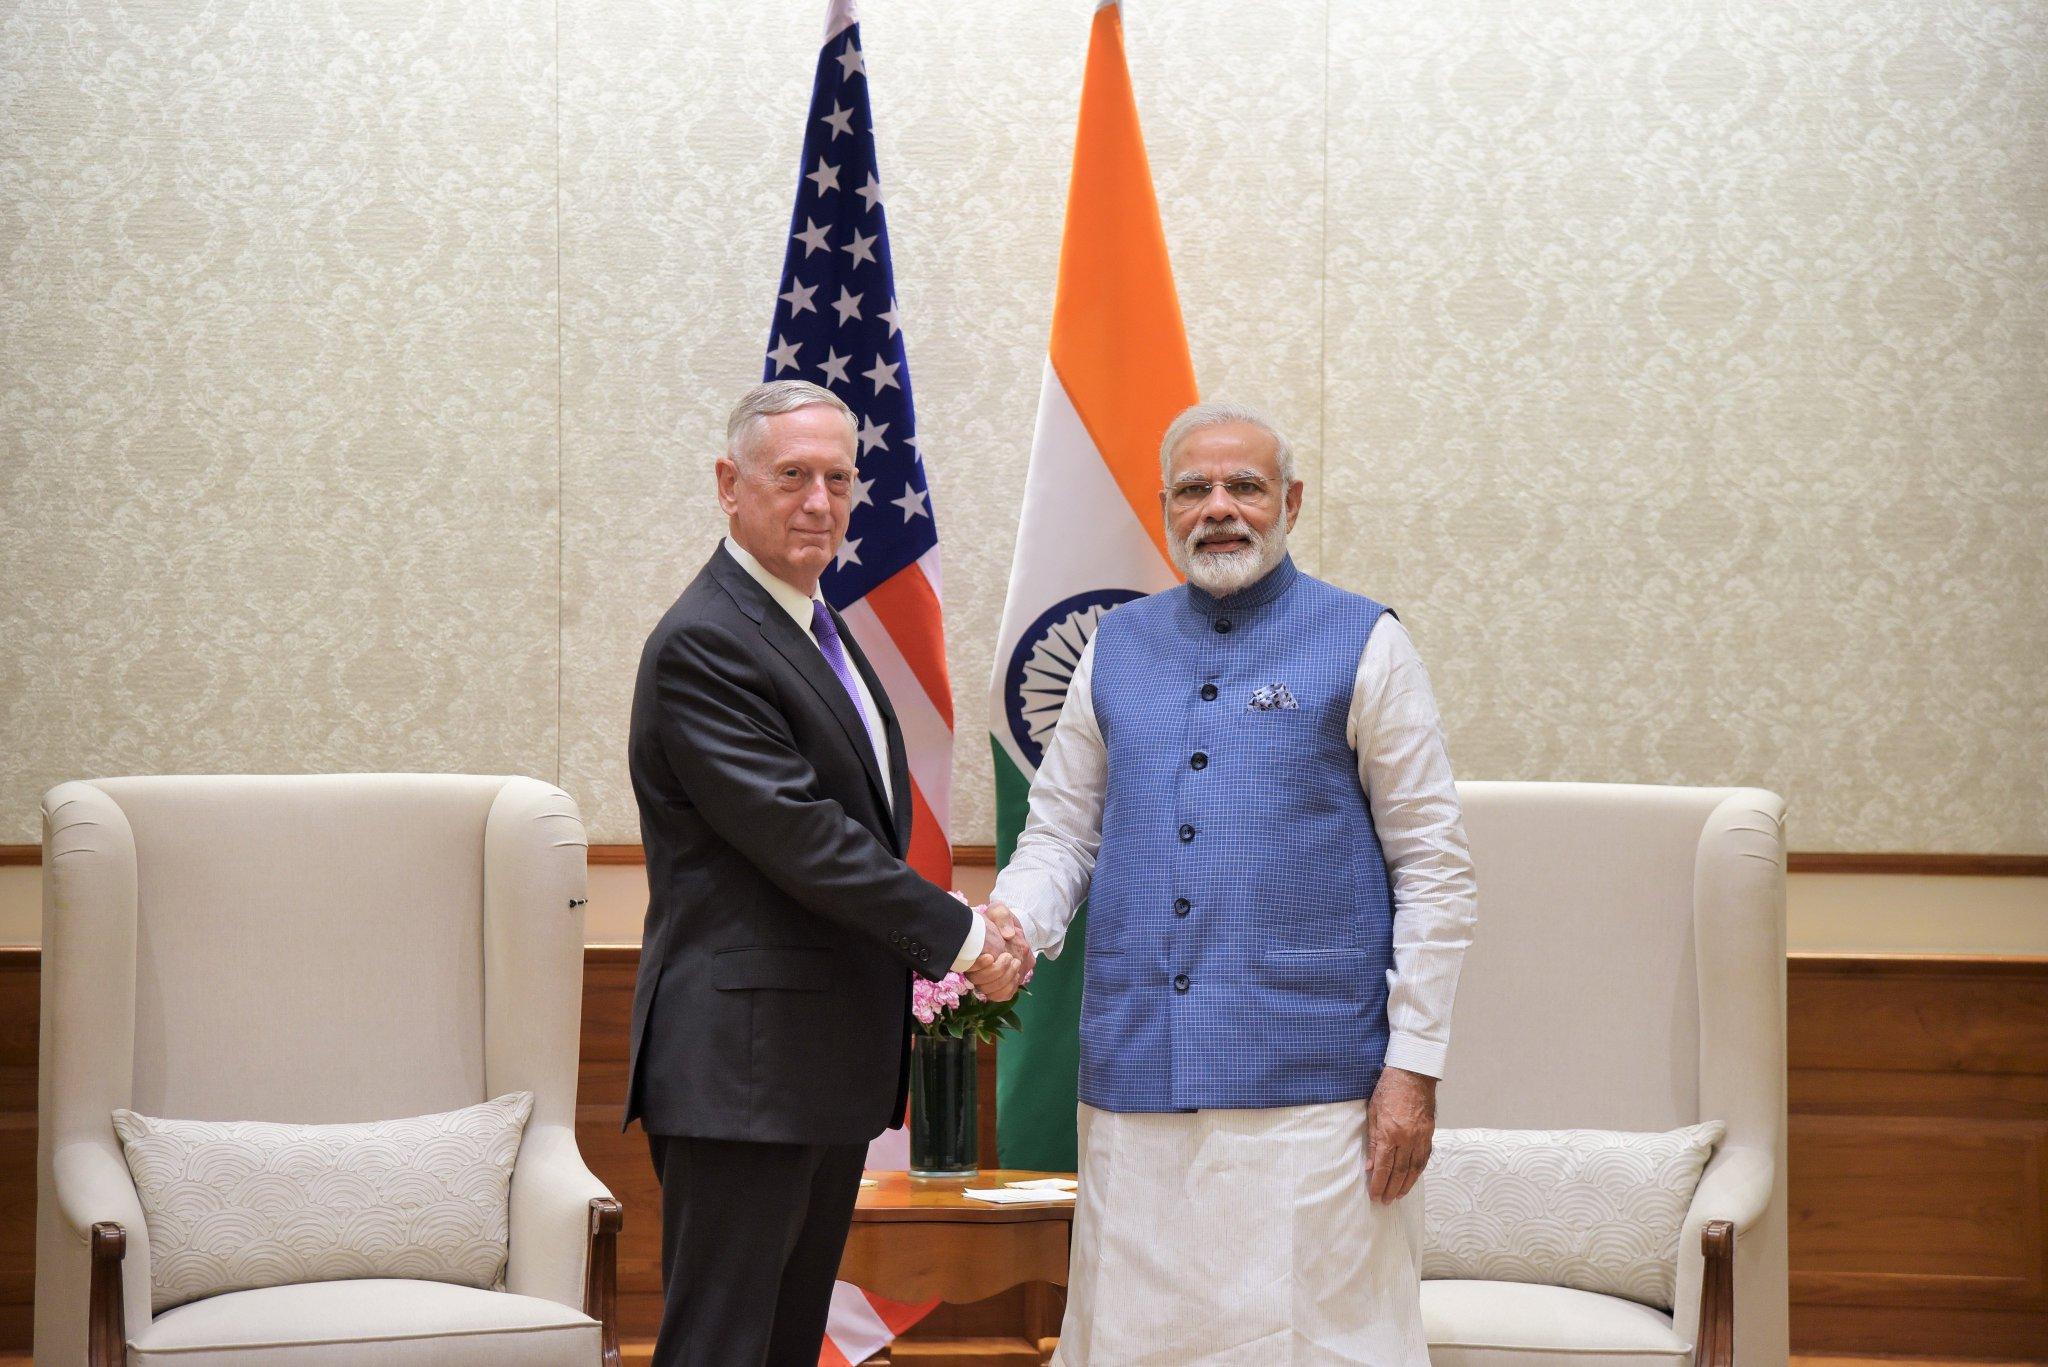 Met Mr. Jim Mattis, Secretary @DeptofDefense and discussed India-USA relations. https://t.co/rx8c7ISmYa